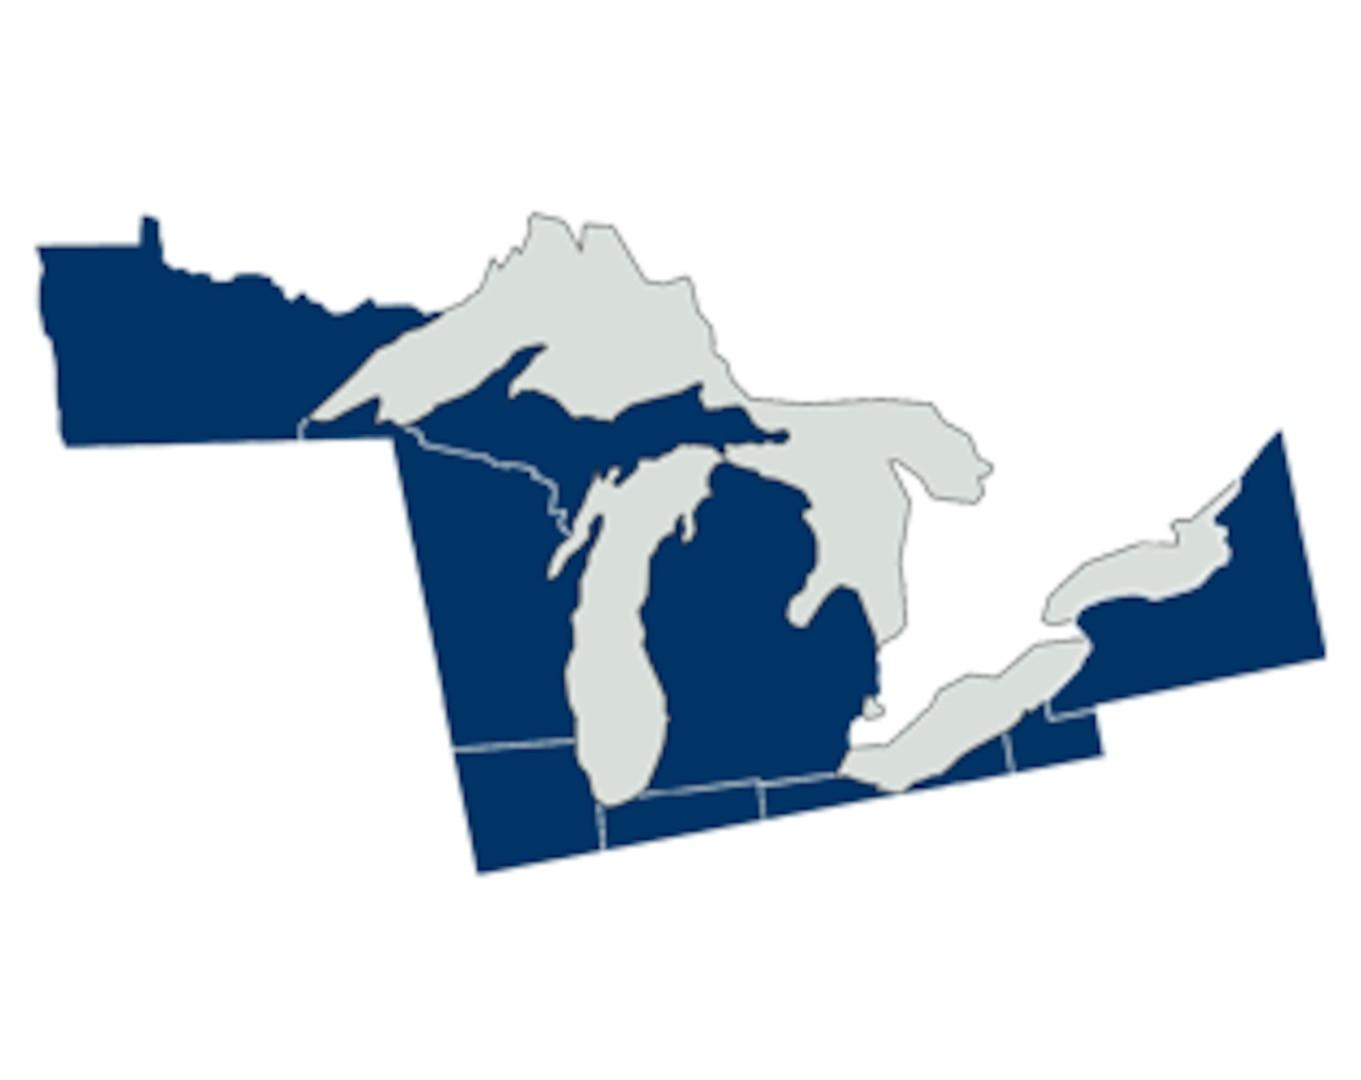 District 9: Indiana, Michigan, Minnesota, New York, Ohio, Pennsylvania, Winsconsin